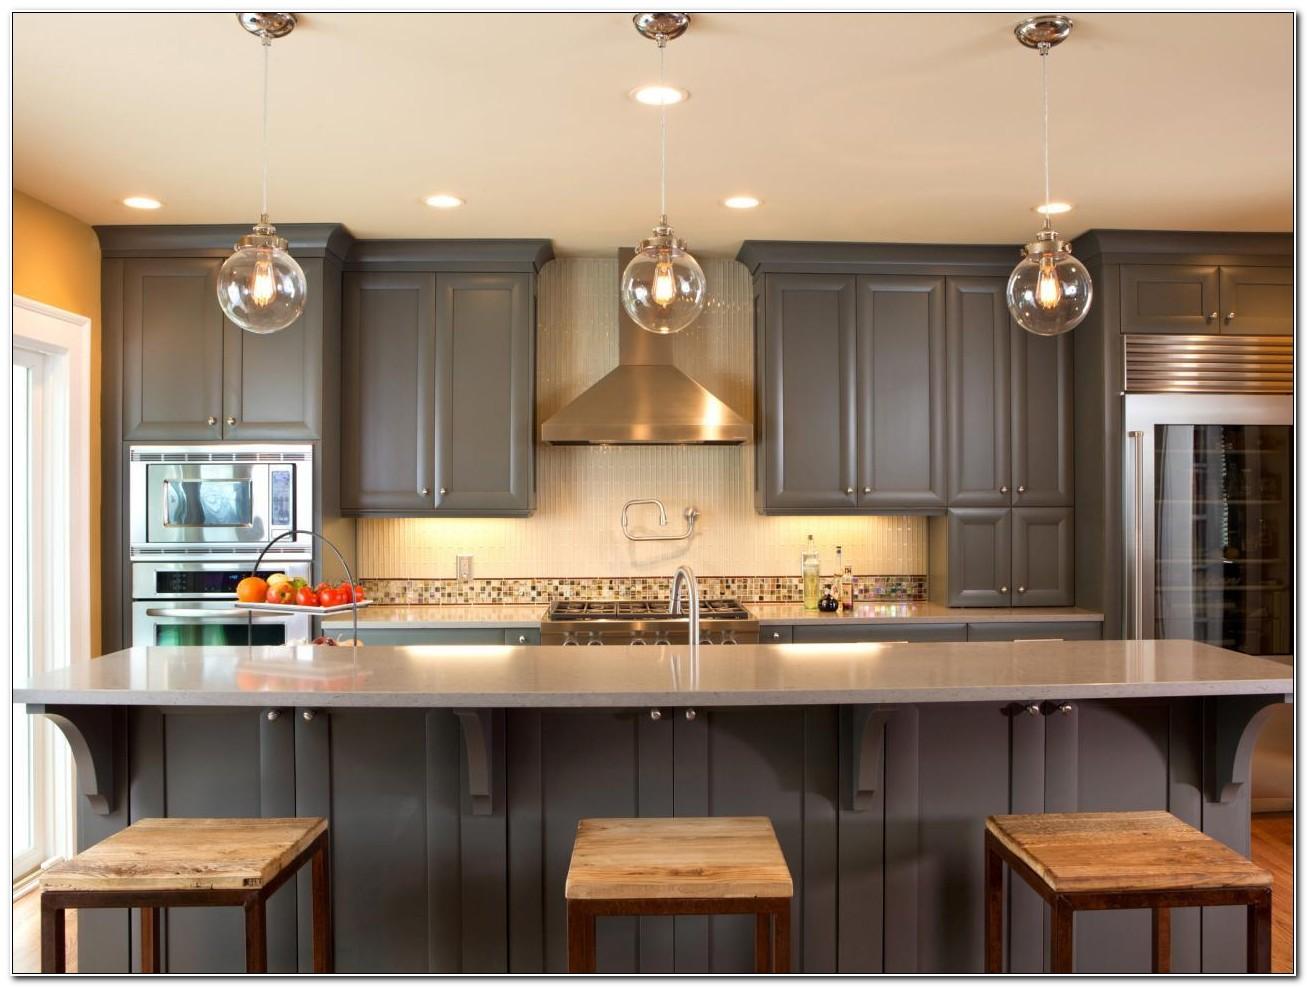 Kitchen Cabinet Staining Ideas